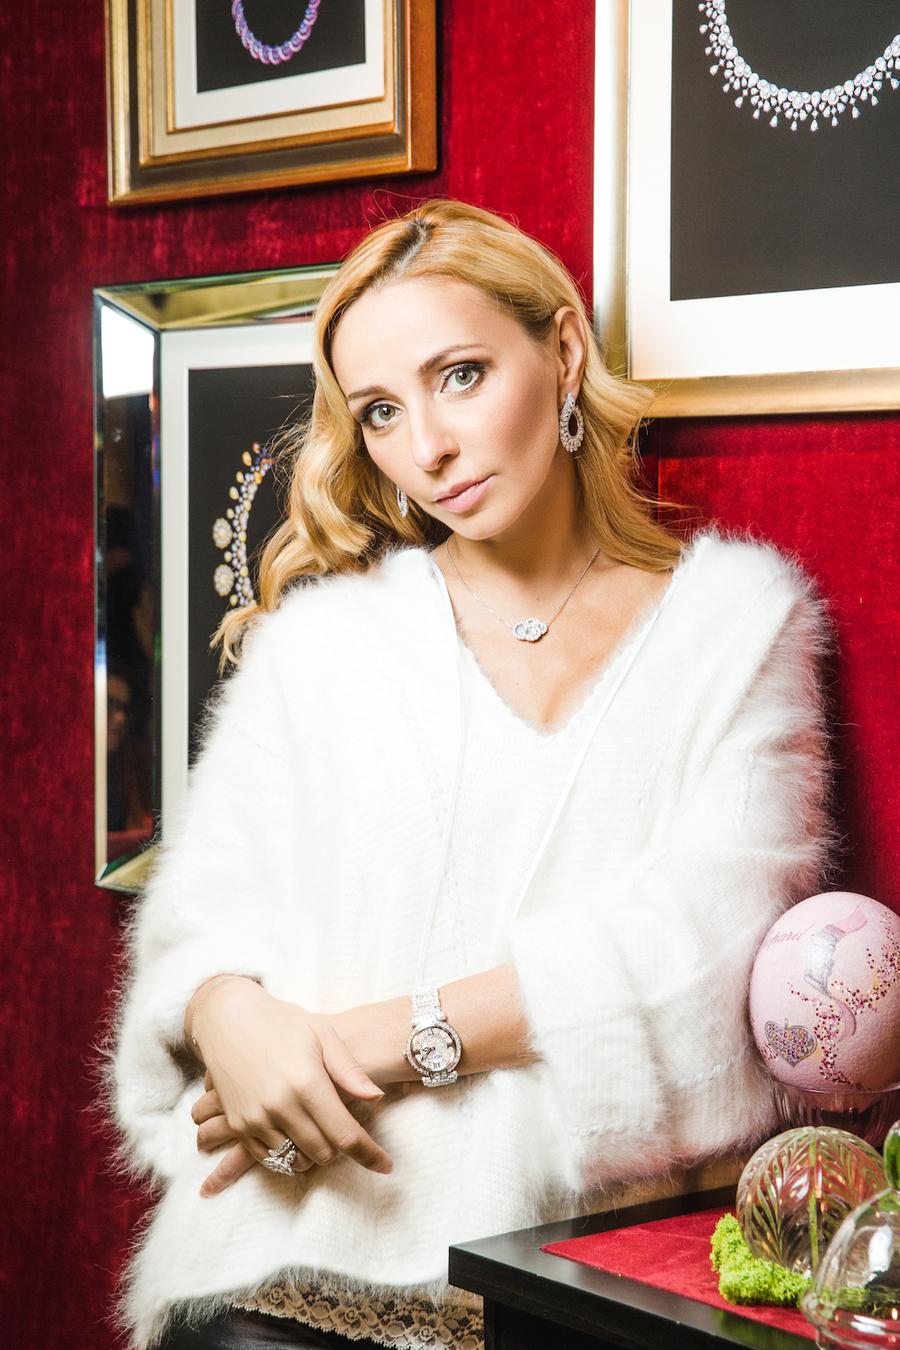 Татьяна Навка - официальный посол бренда Chopard Bba1211ee7df